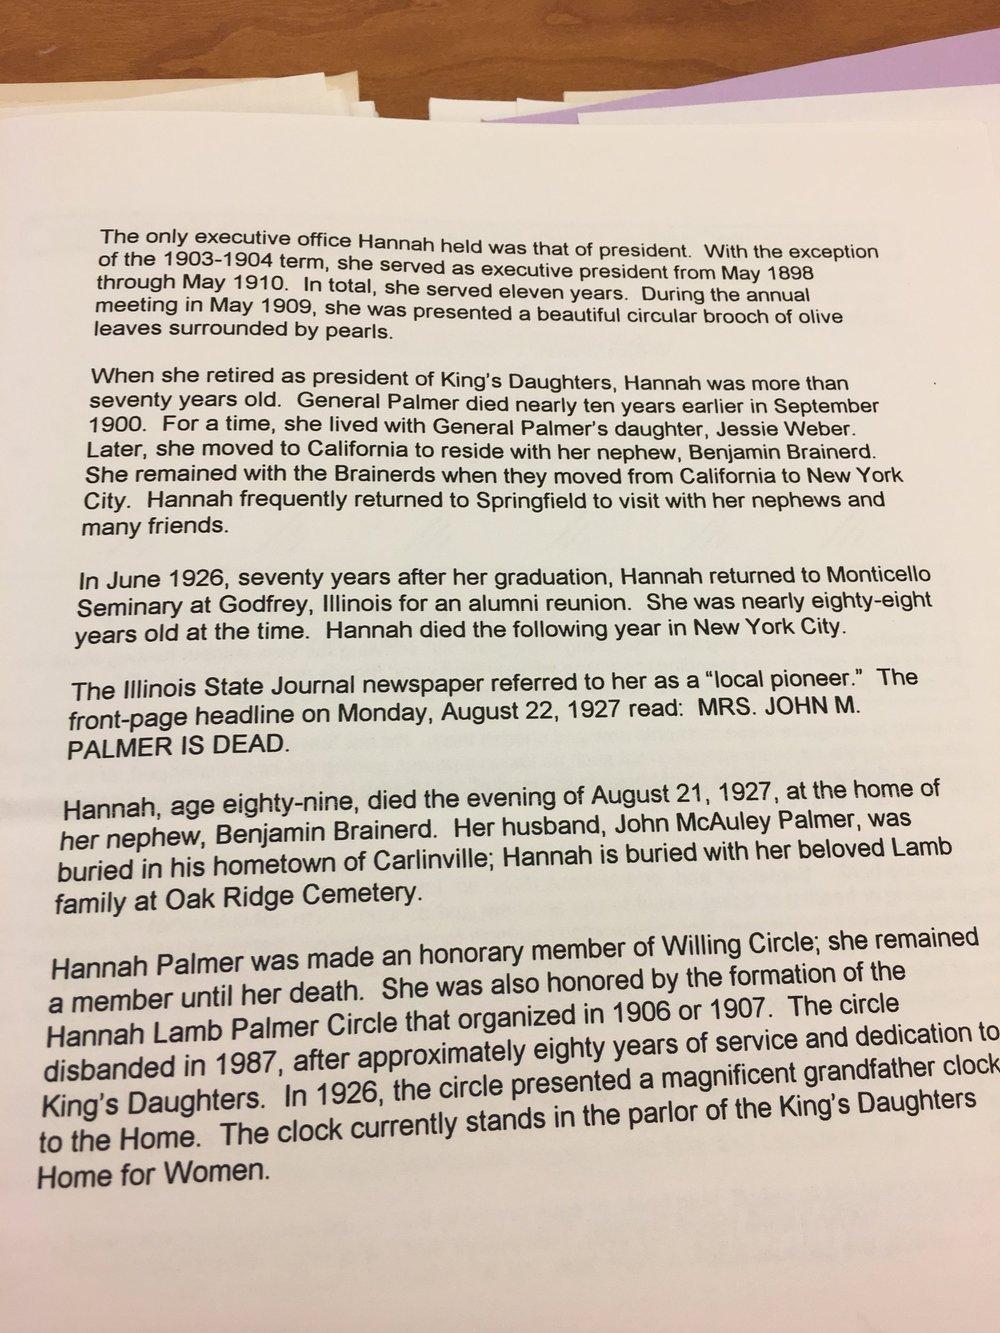 Hannah Palmer historical reflection.jpg